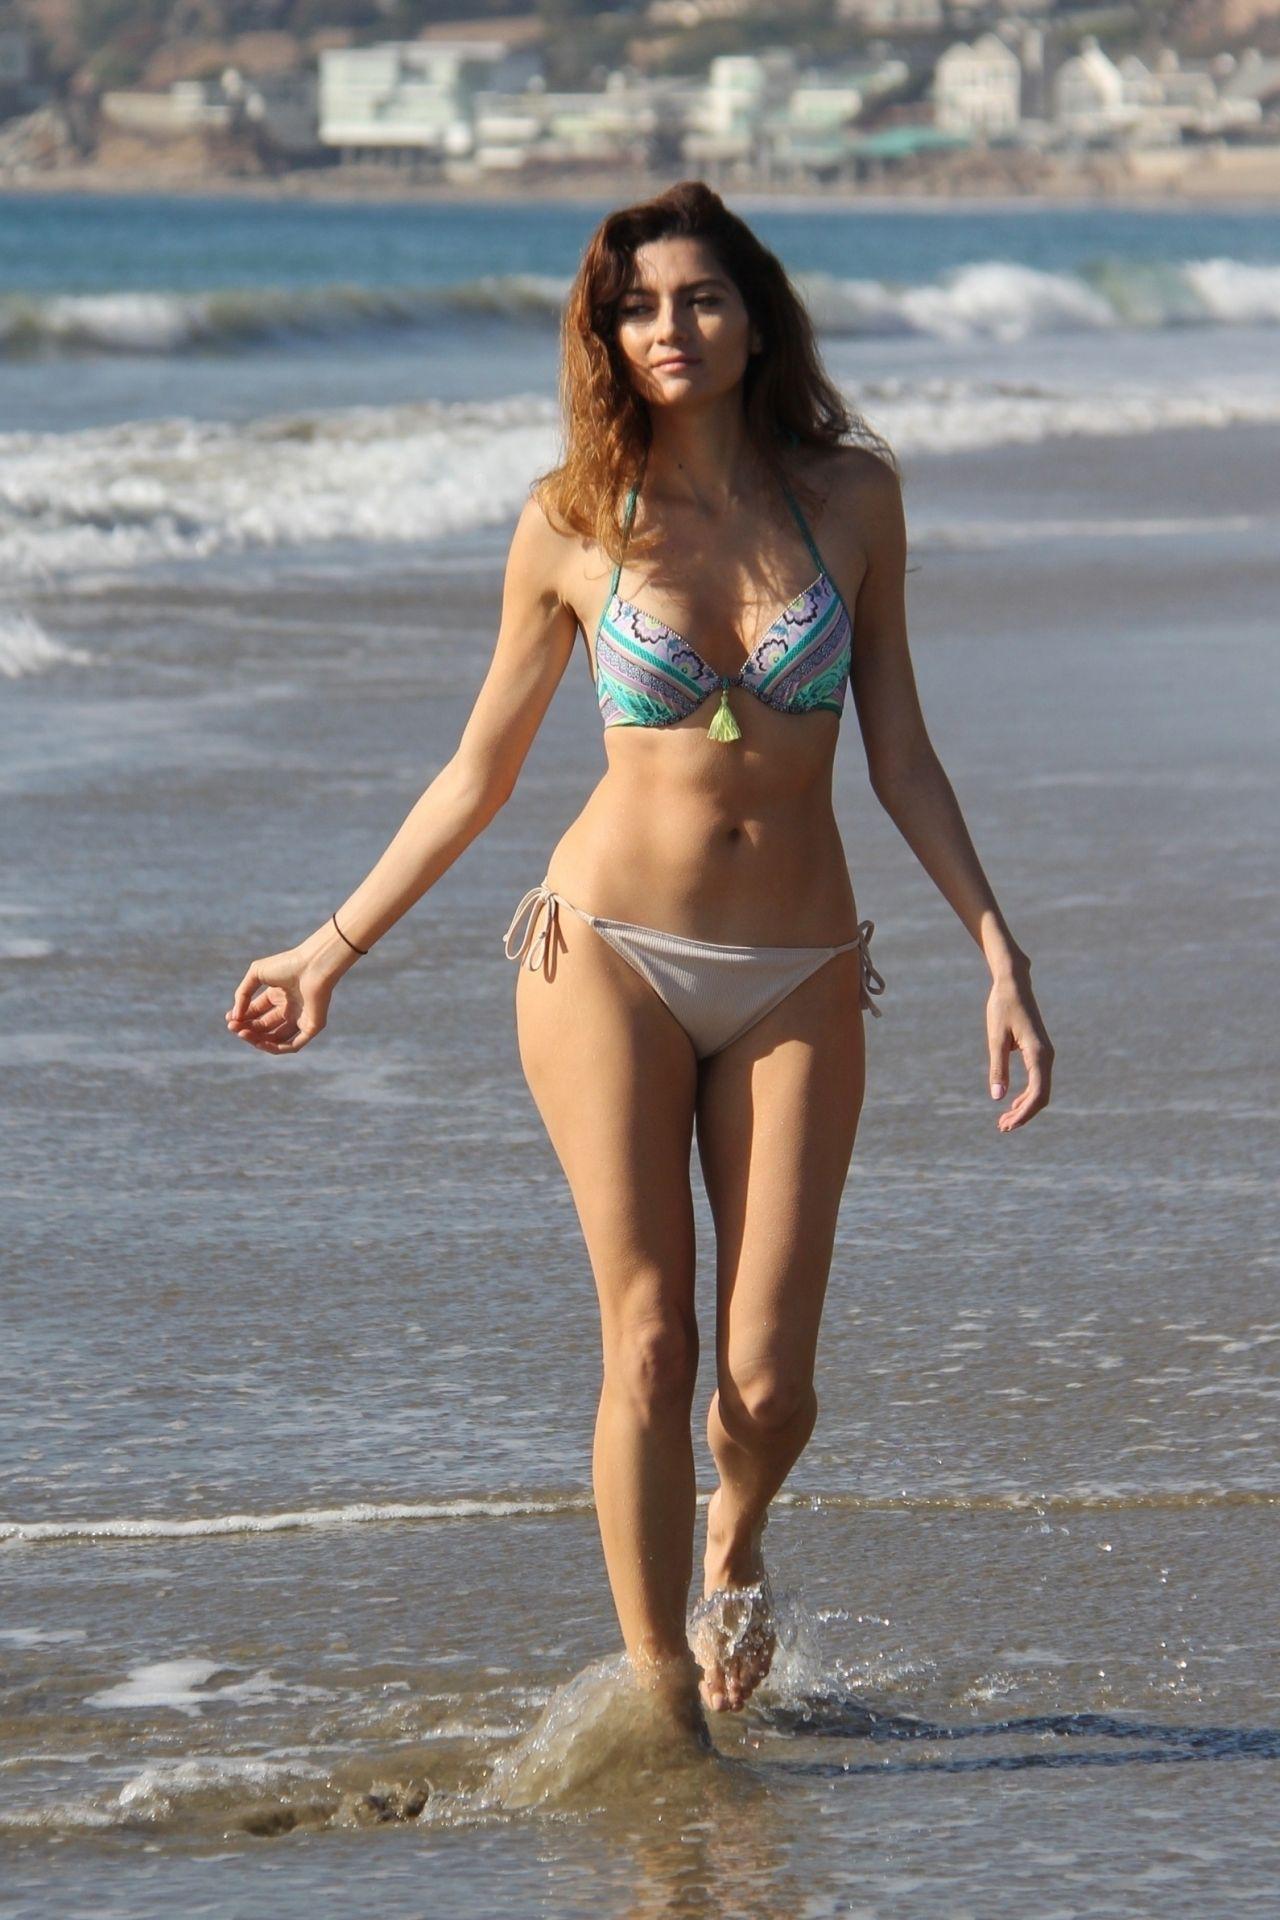 Blanca Blanco Shows Off Her Bikini Body At The Beach In Malibu